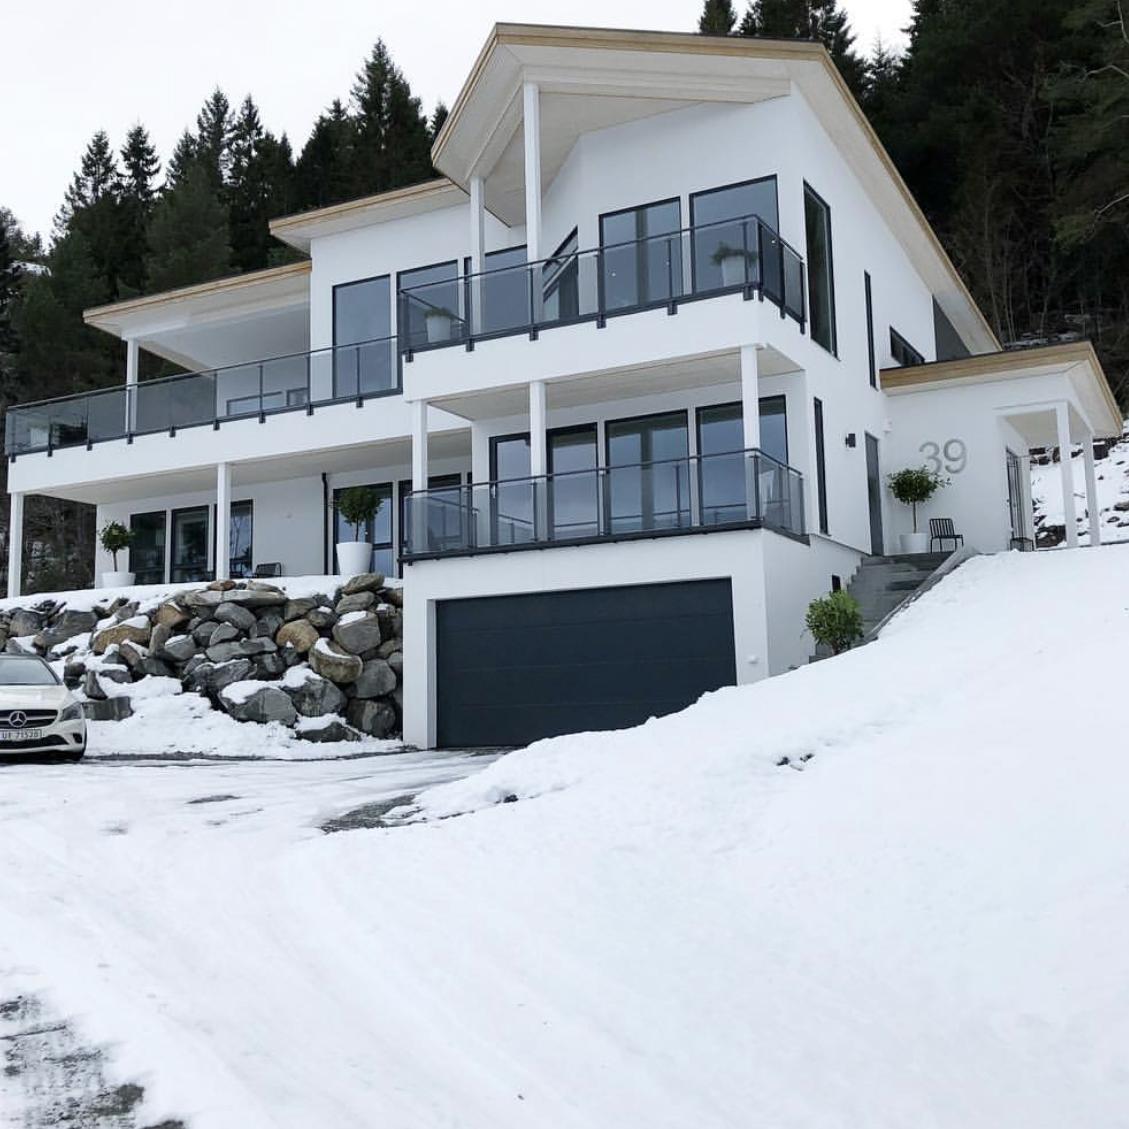 Valø huset